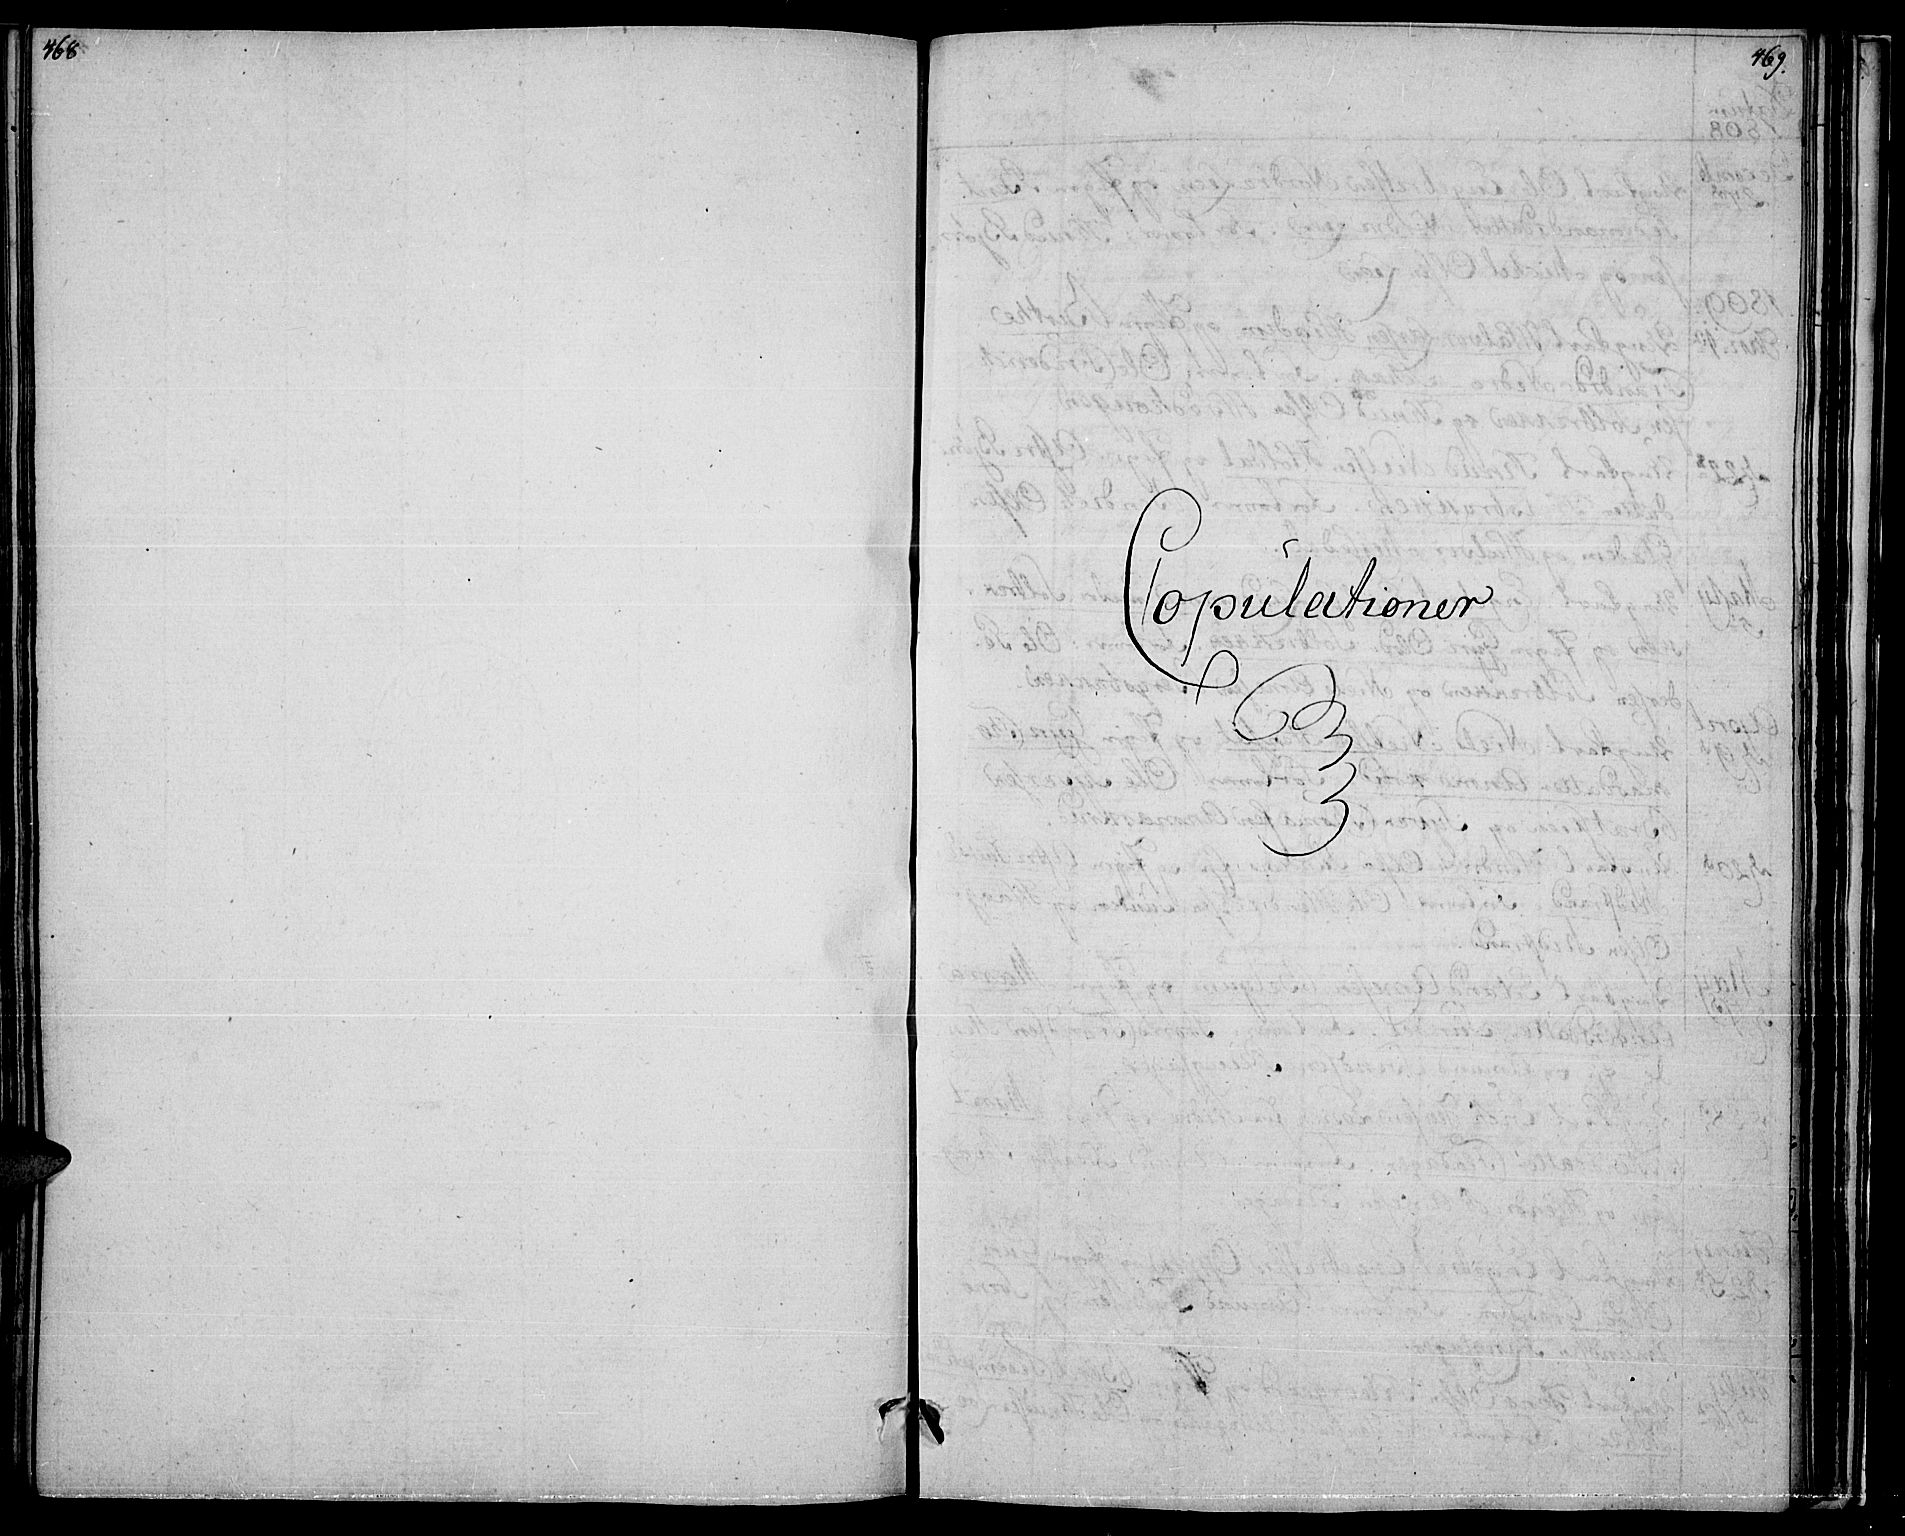 SAH, Nord-Aurdal prestekontor, Ministerialbok nr. 1, 1808-1815, s. 468-469